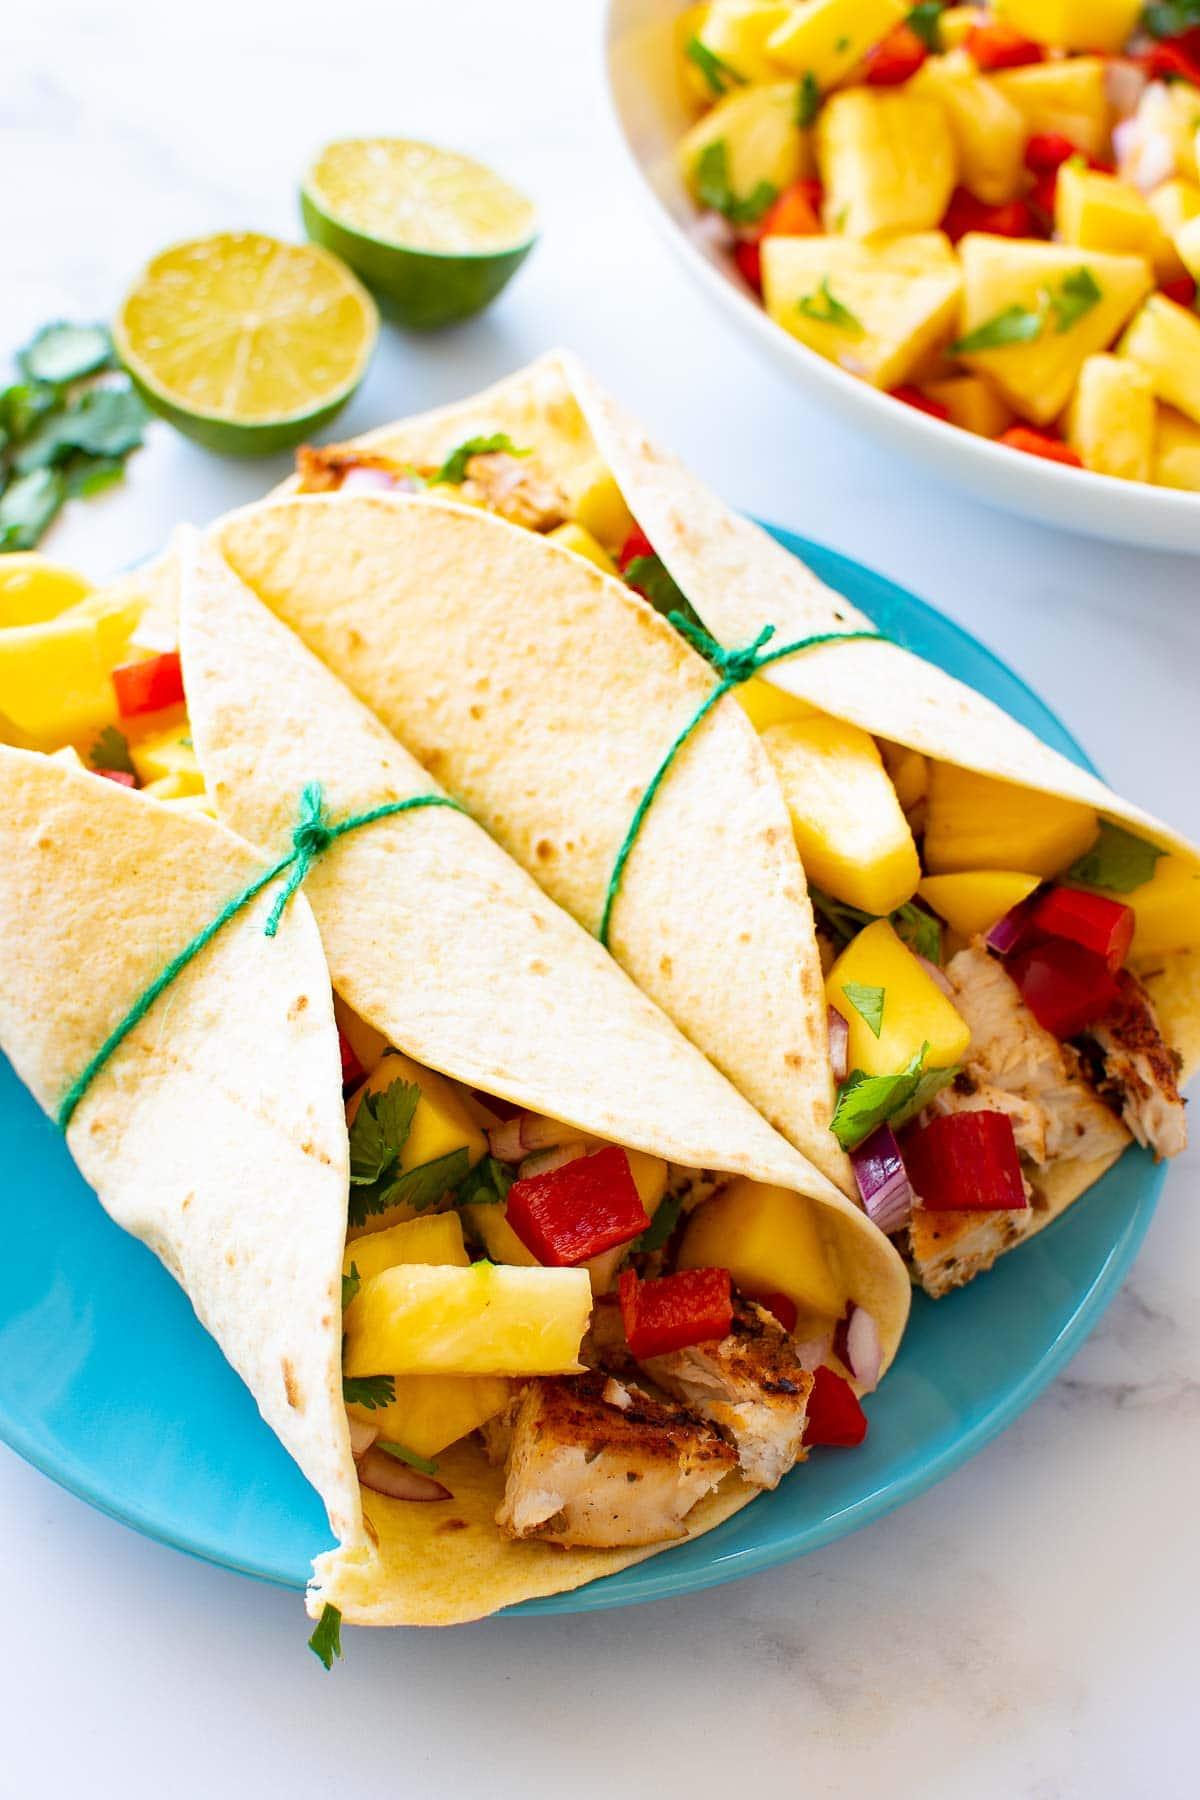 Tacos with blackened swordfish and mango pineapple salsa.